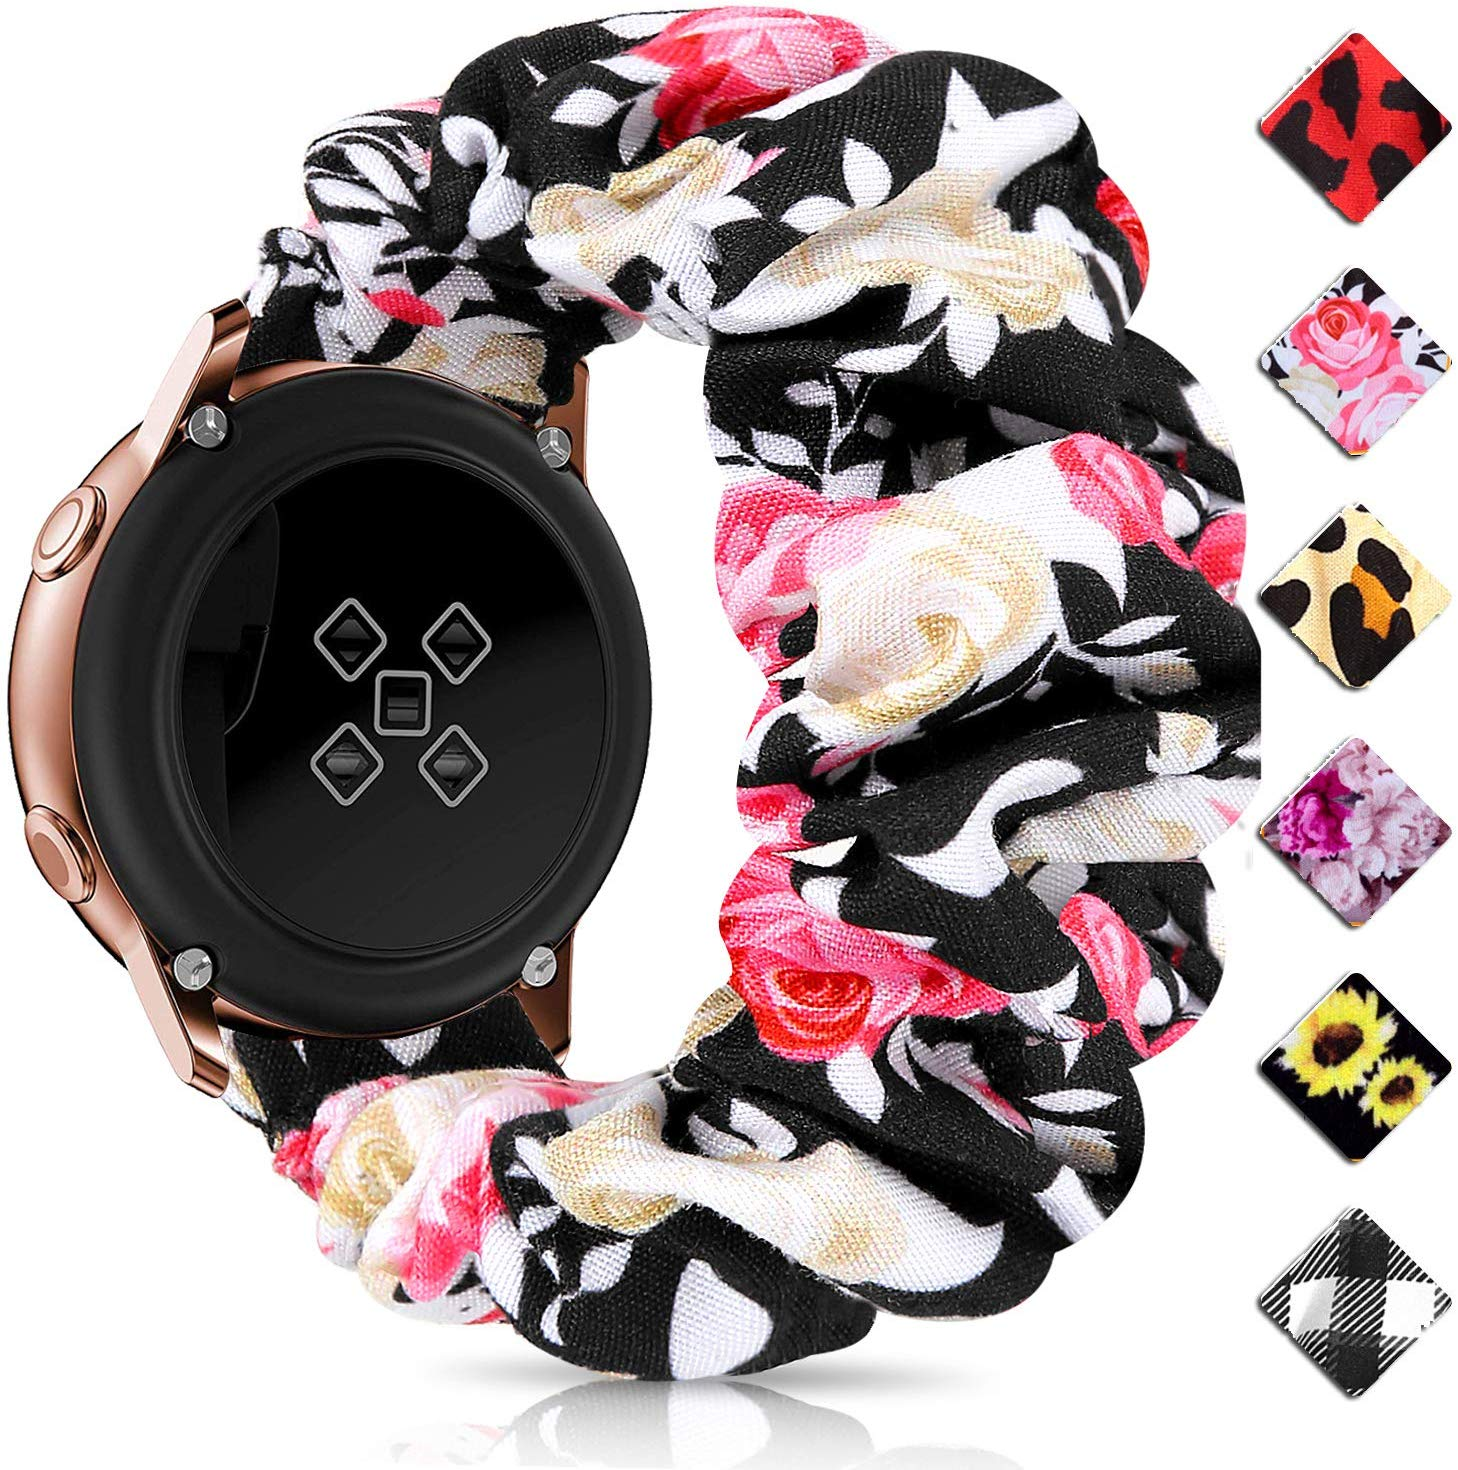 20mm 22mm Quick Release Watch Bands Elastic Scrunchie Watch Band Women For Samsung Galaxy Watch Gear S3 S2 42mm 46mm